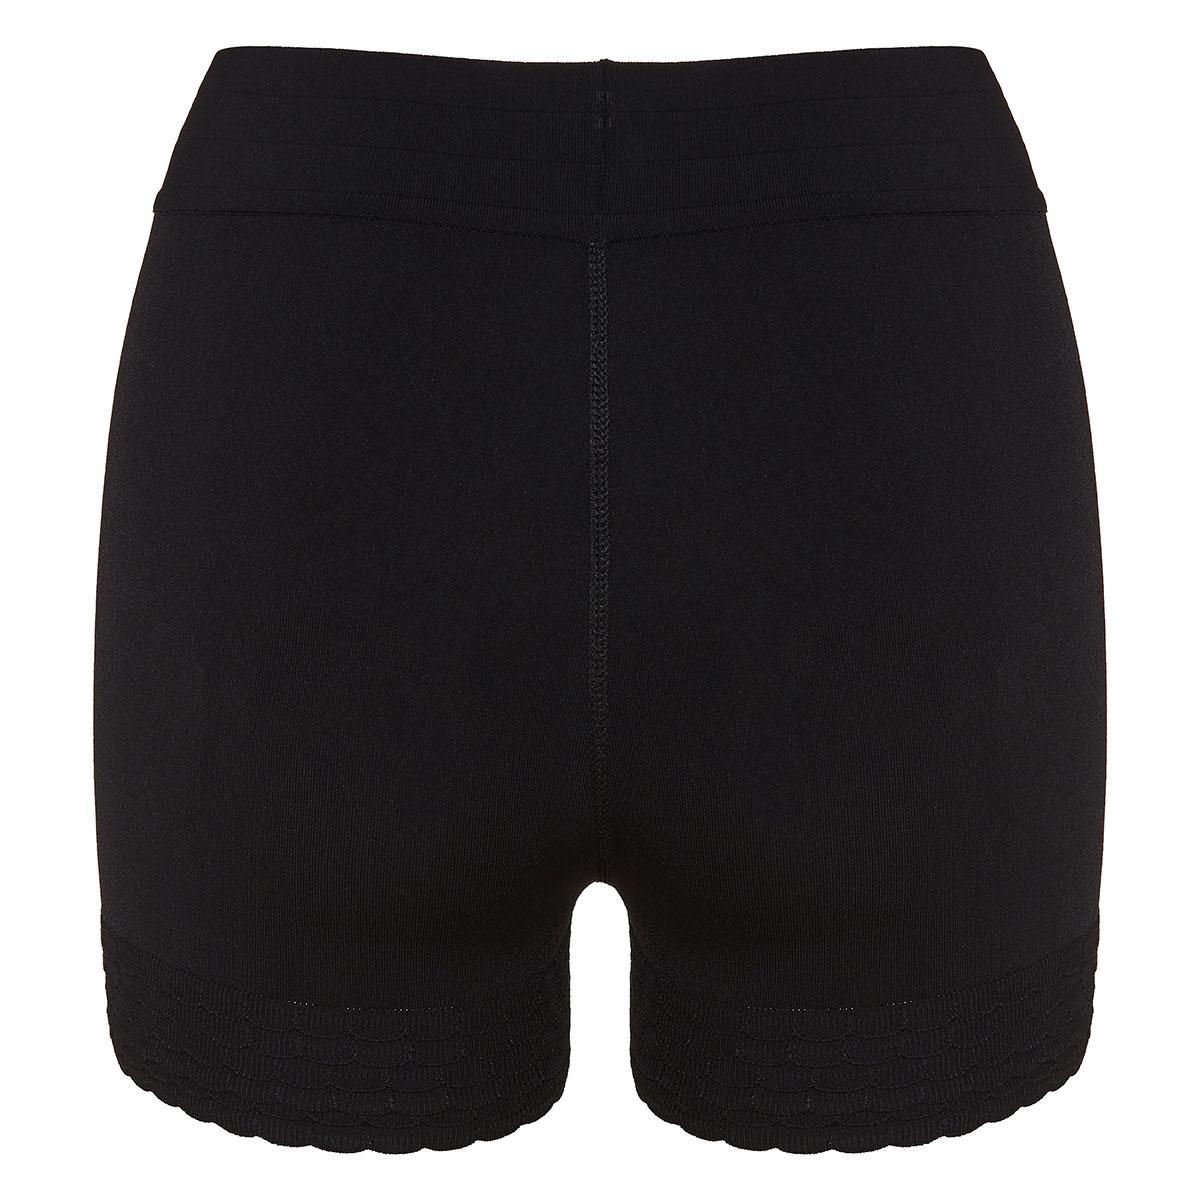 Stretch-knit scalloped shorts